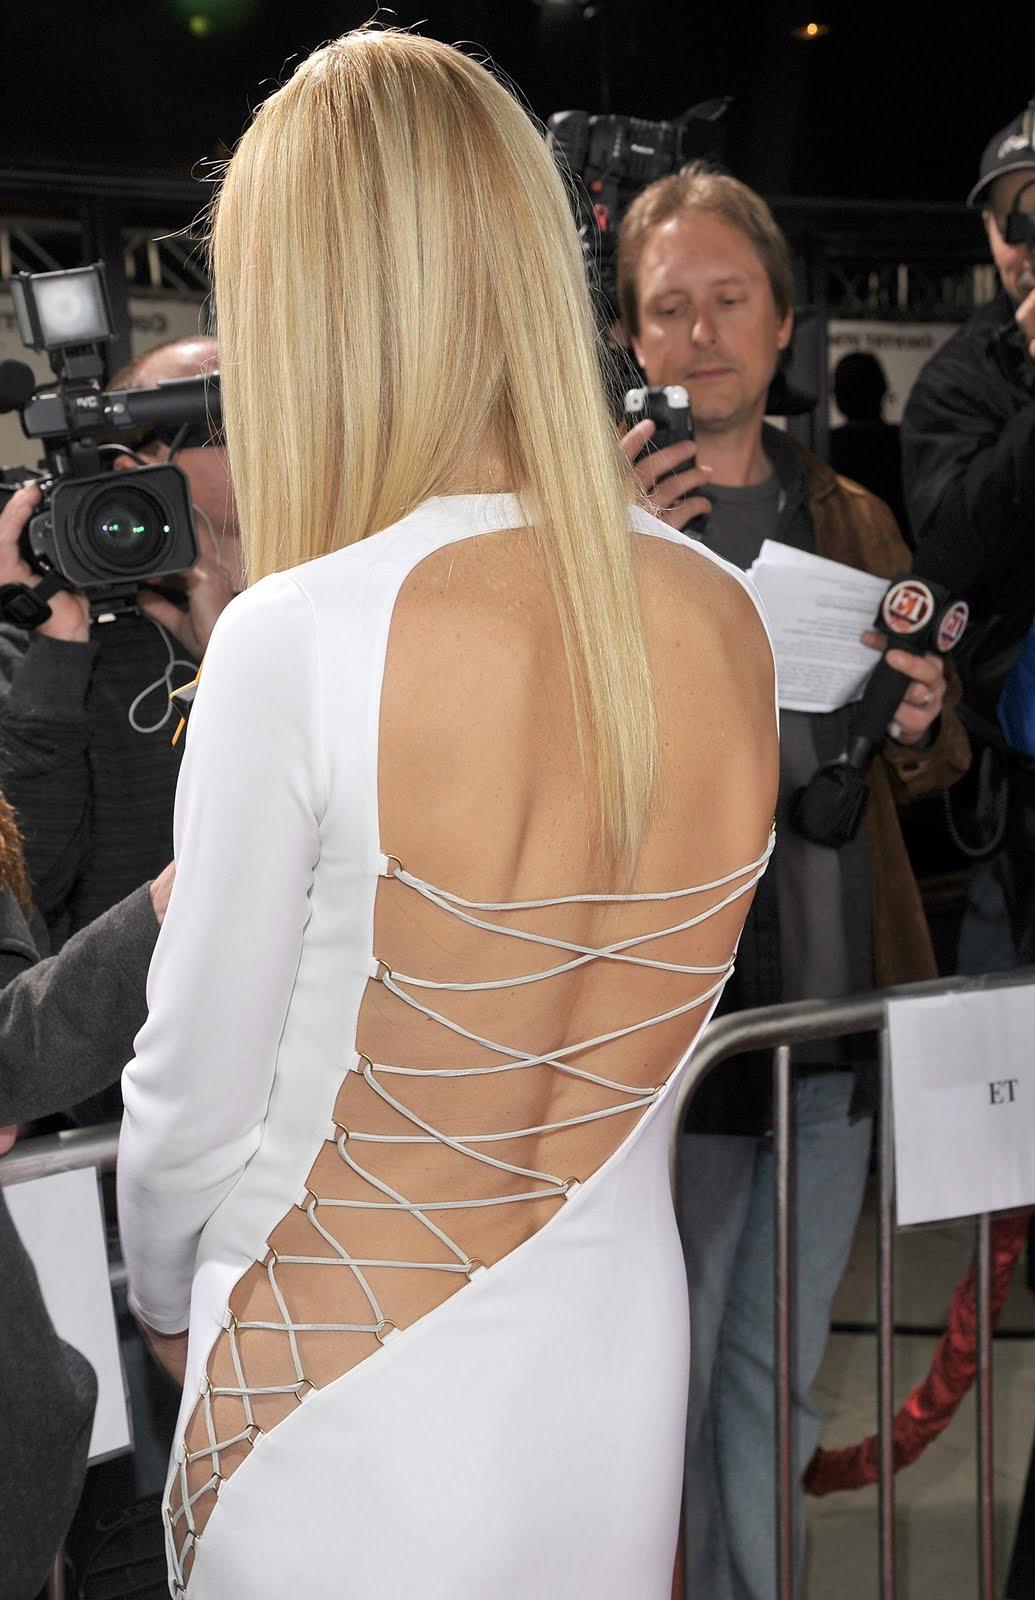 http://3.bp.blogspot.com/_9dA_x389xoo/TQkCq4Zg8VI/AAAAAAAAHZ4/wcyapExijQ8/s1600/Gwyneth_Paltrow_Country_Strong_Screening_036.jpg